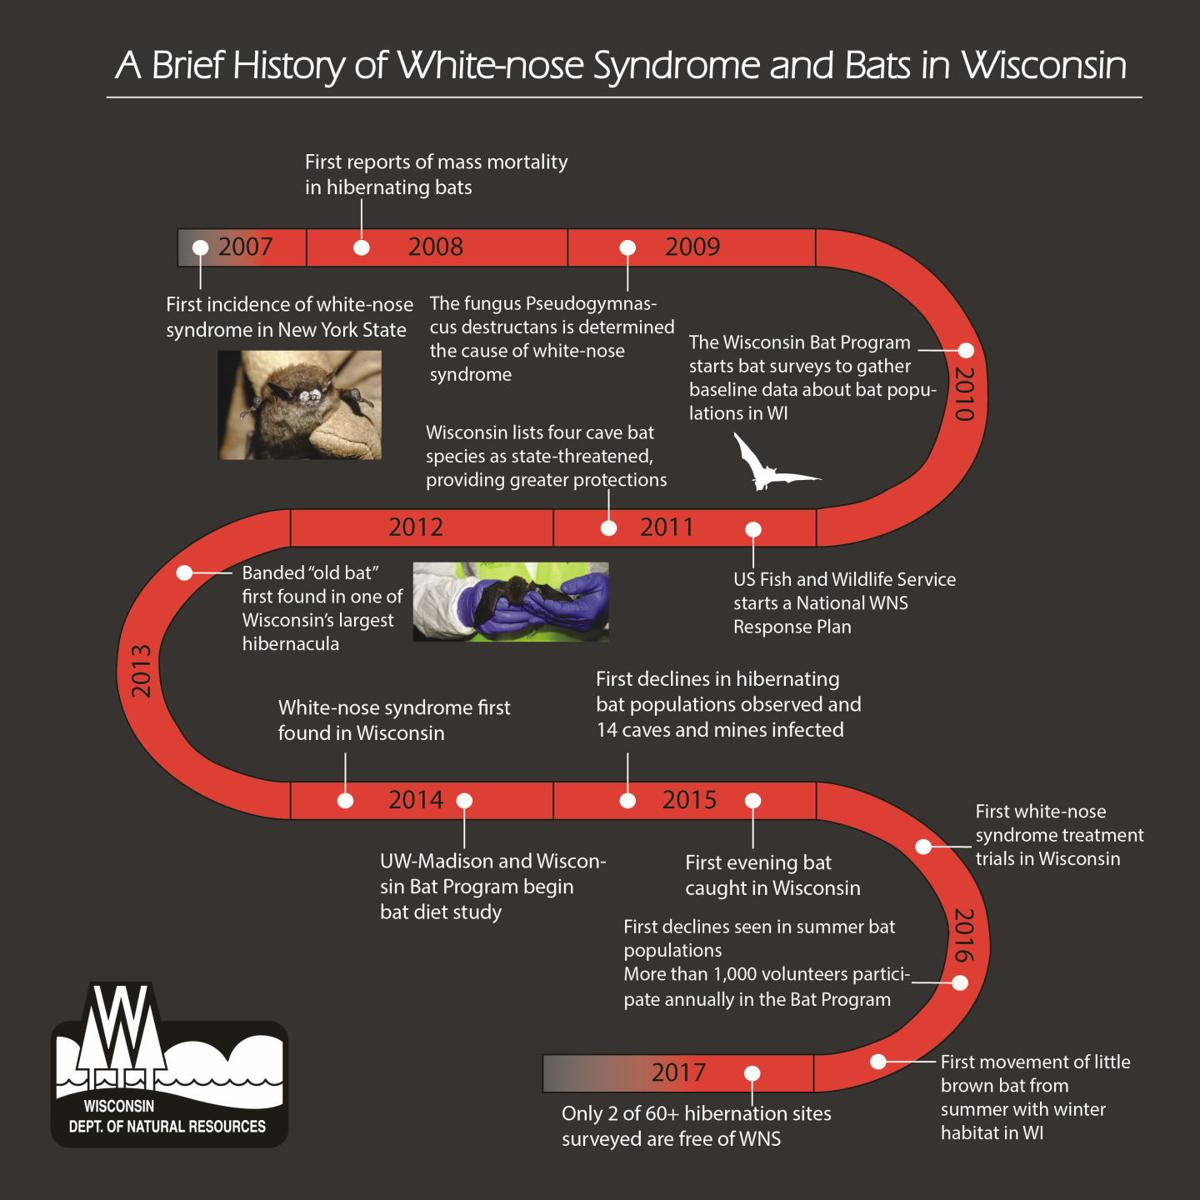 White-nose syndrome timeline